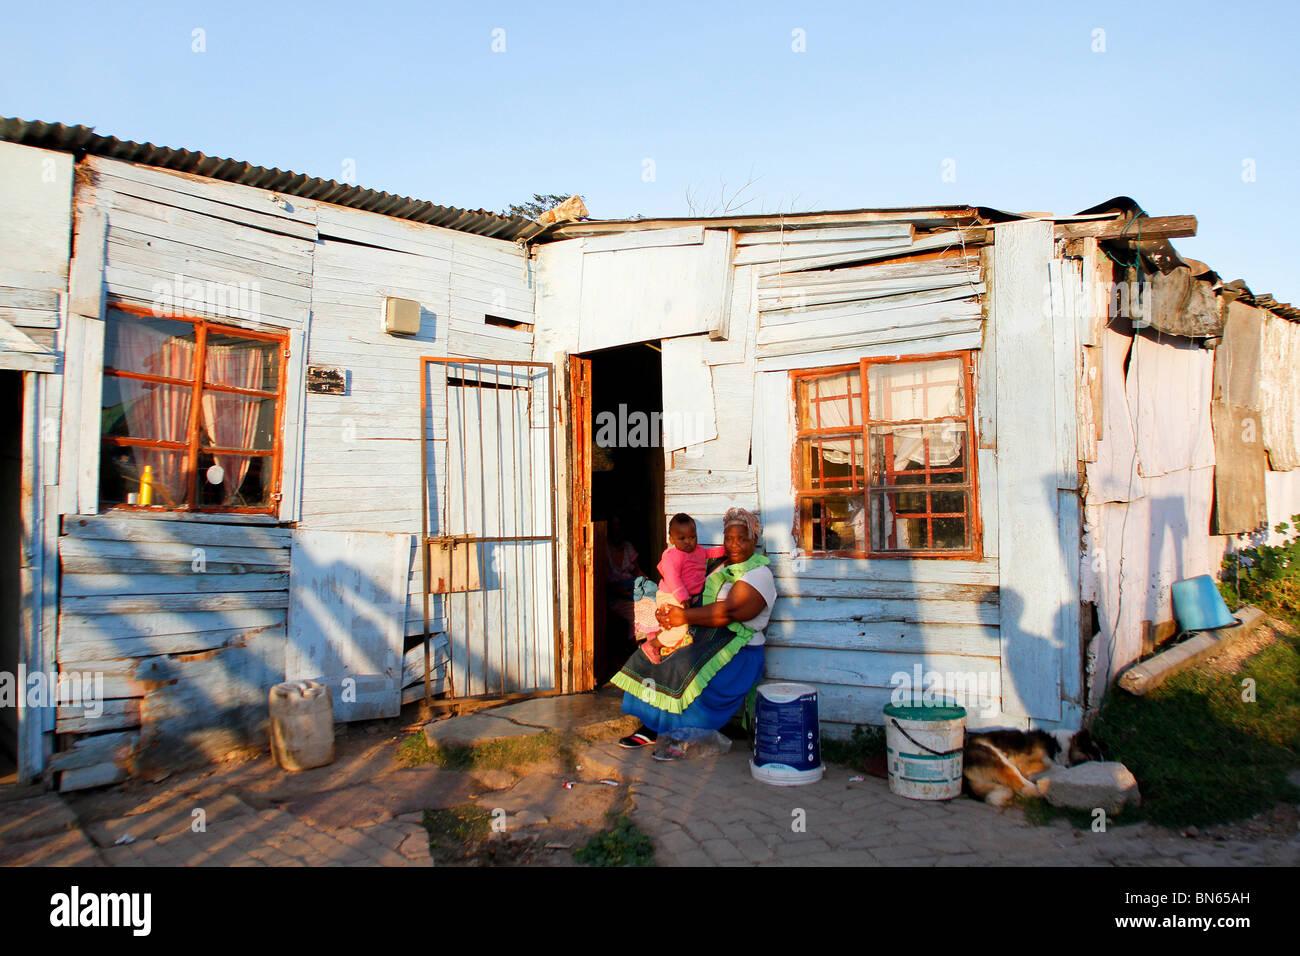 Local people new brighton township port elizabeth south - Population of port elizabeth south africa ...